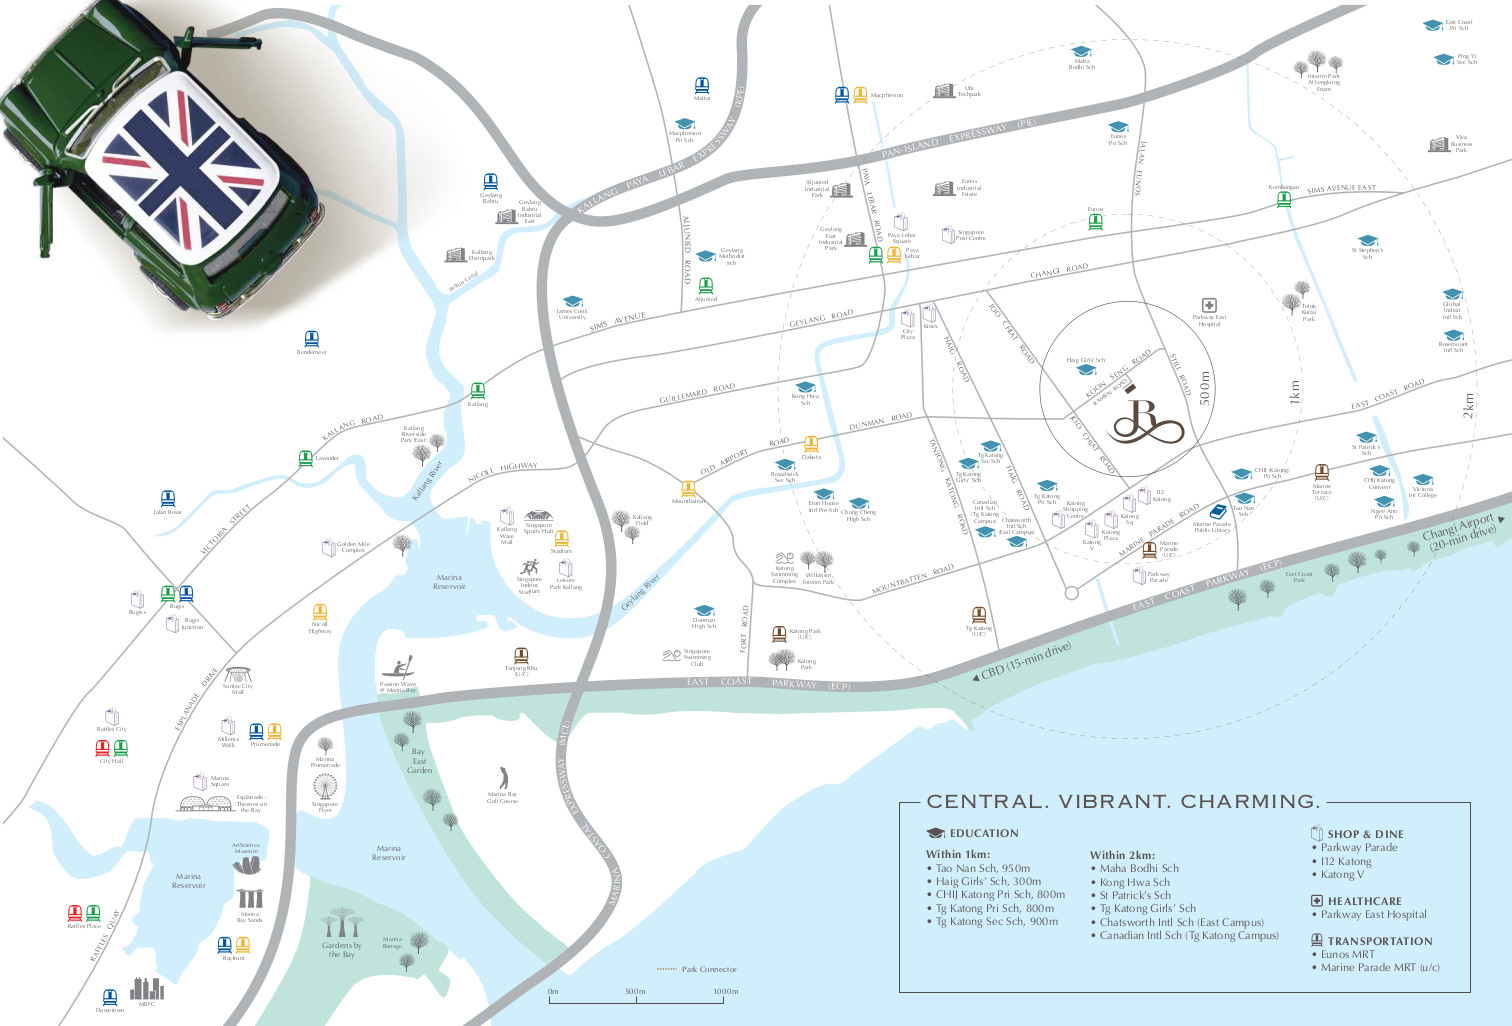 The Ramford Location Plan